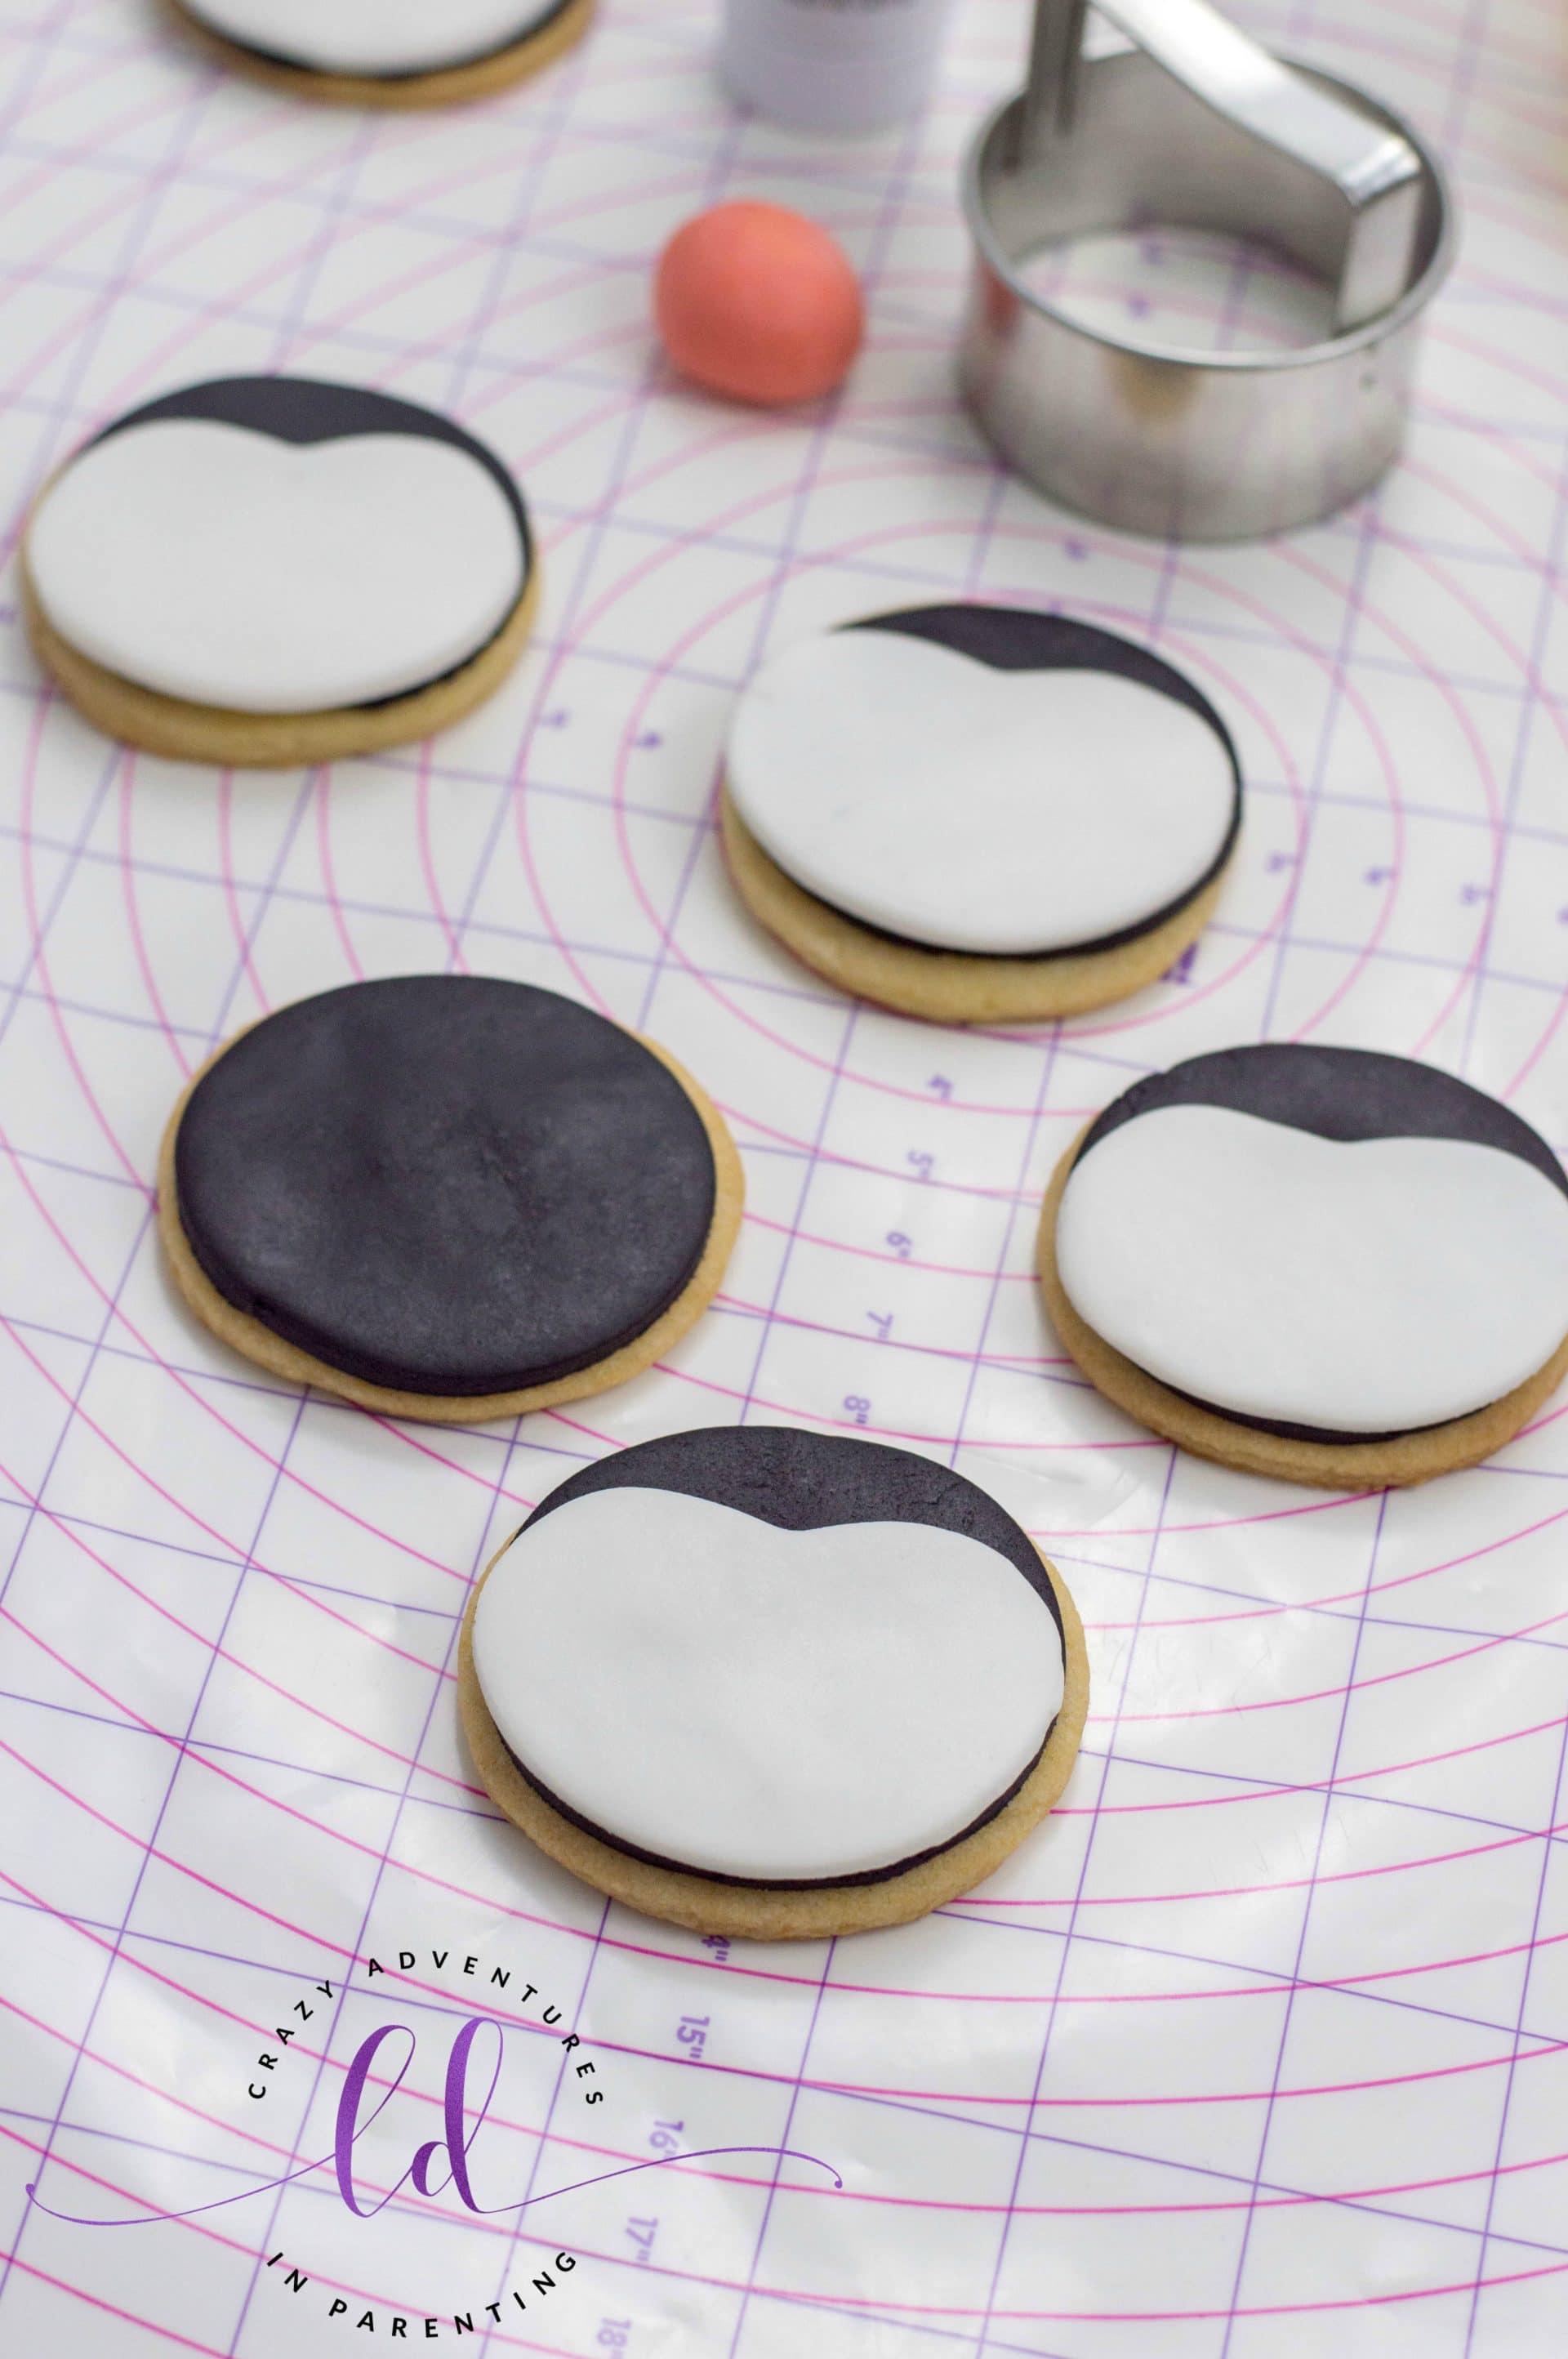 Add Fondant to Penguin Cookies